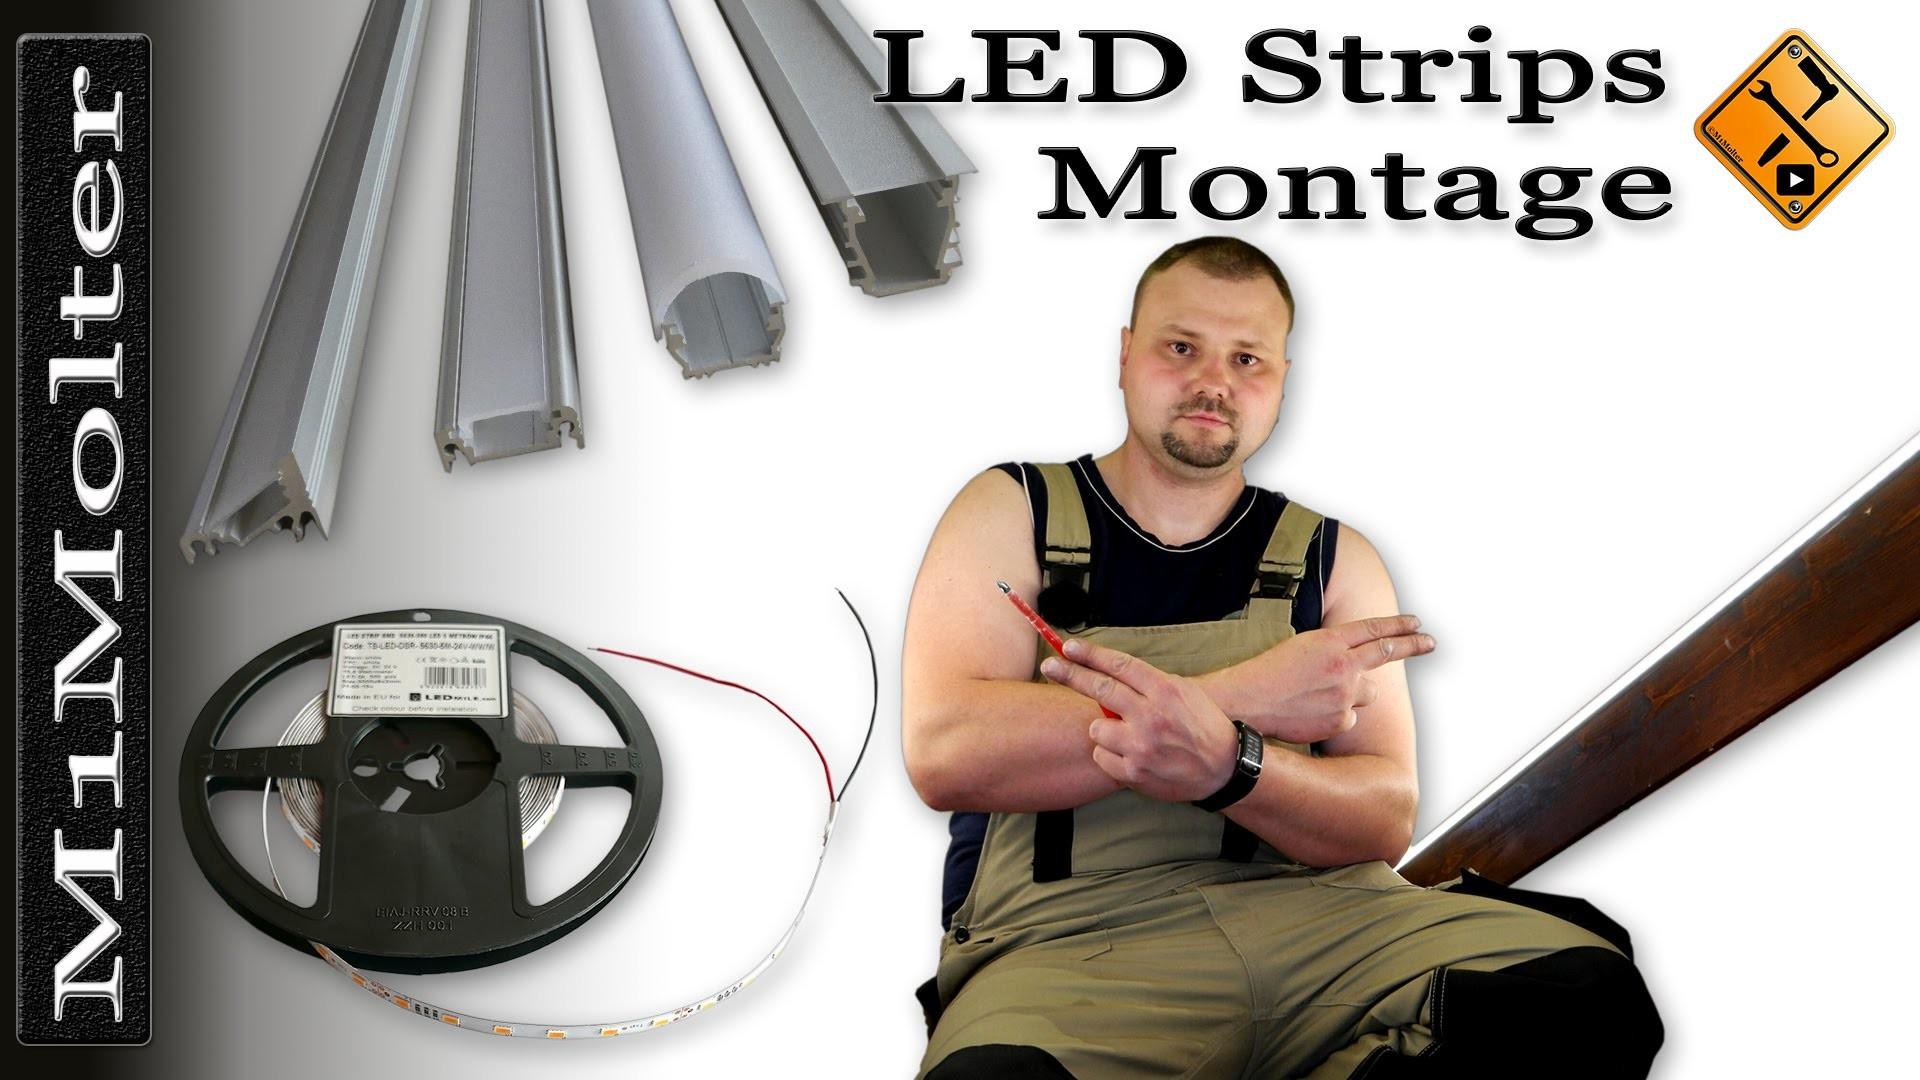 led leisten stripes installation montage von m1molter. Black Bedroom Furniture Sets. Home Design Ideas